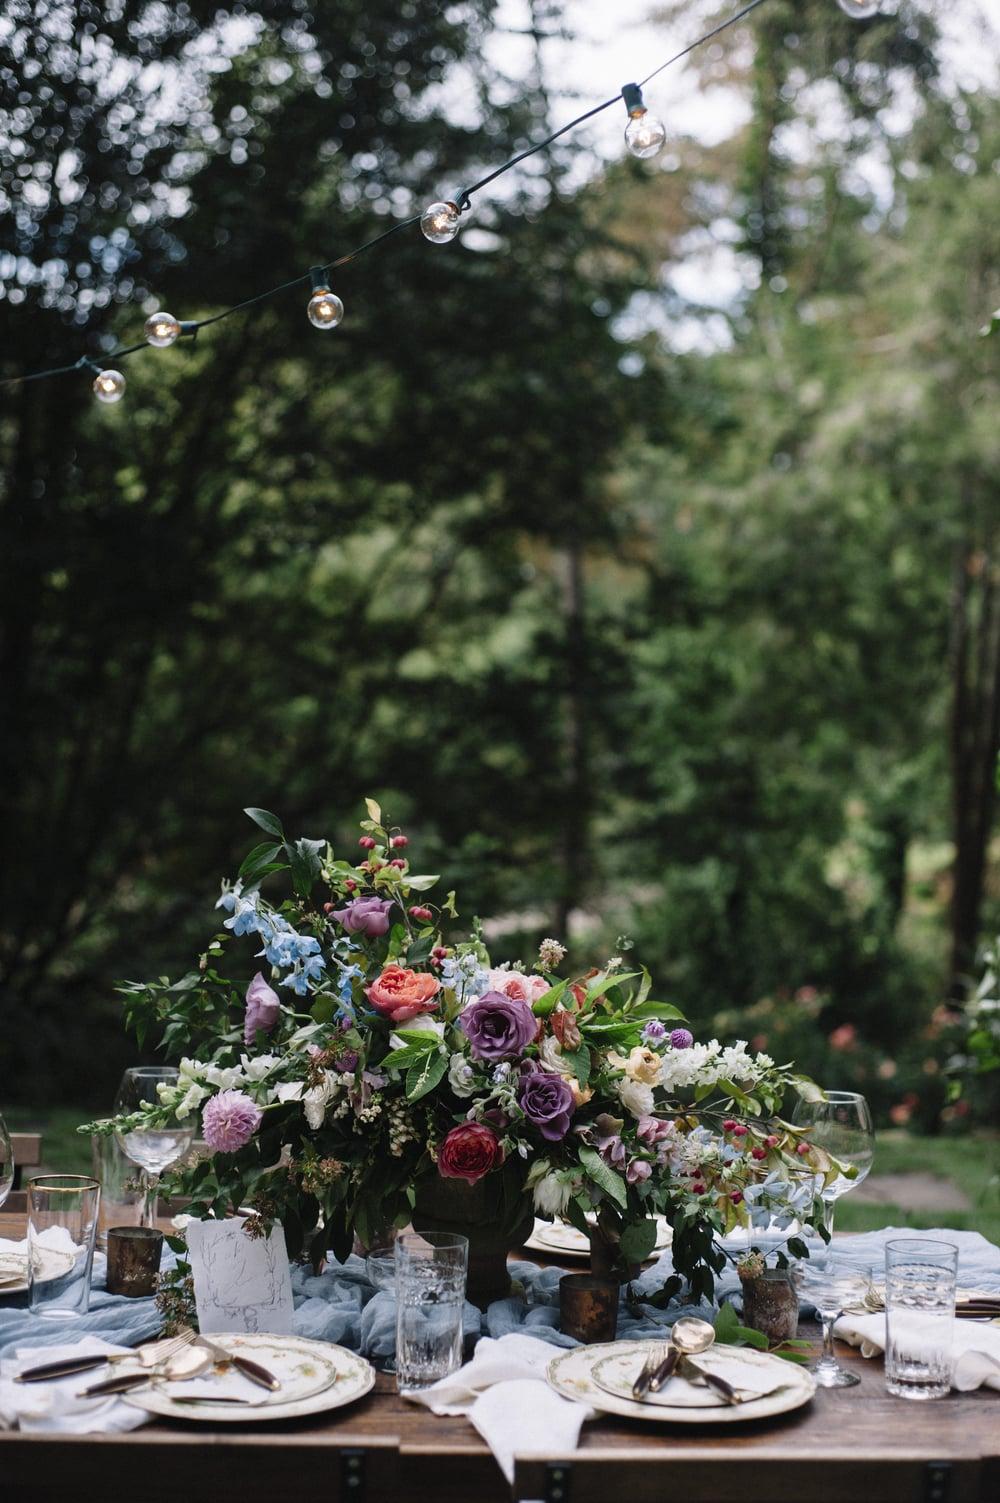 amy-osaba-events-flower-workshop-katie-hyatt-blue-dress-pink-flowers-bouquet43.jpg